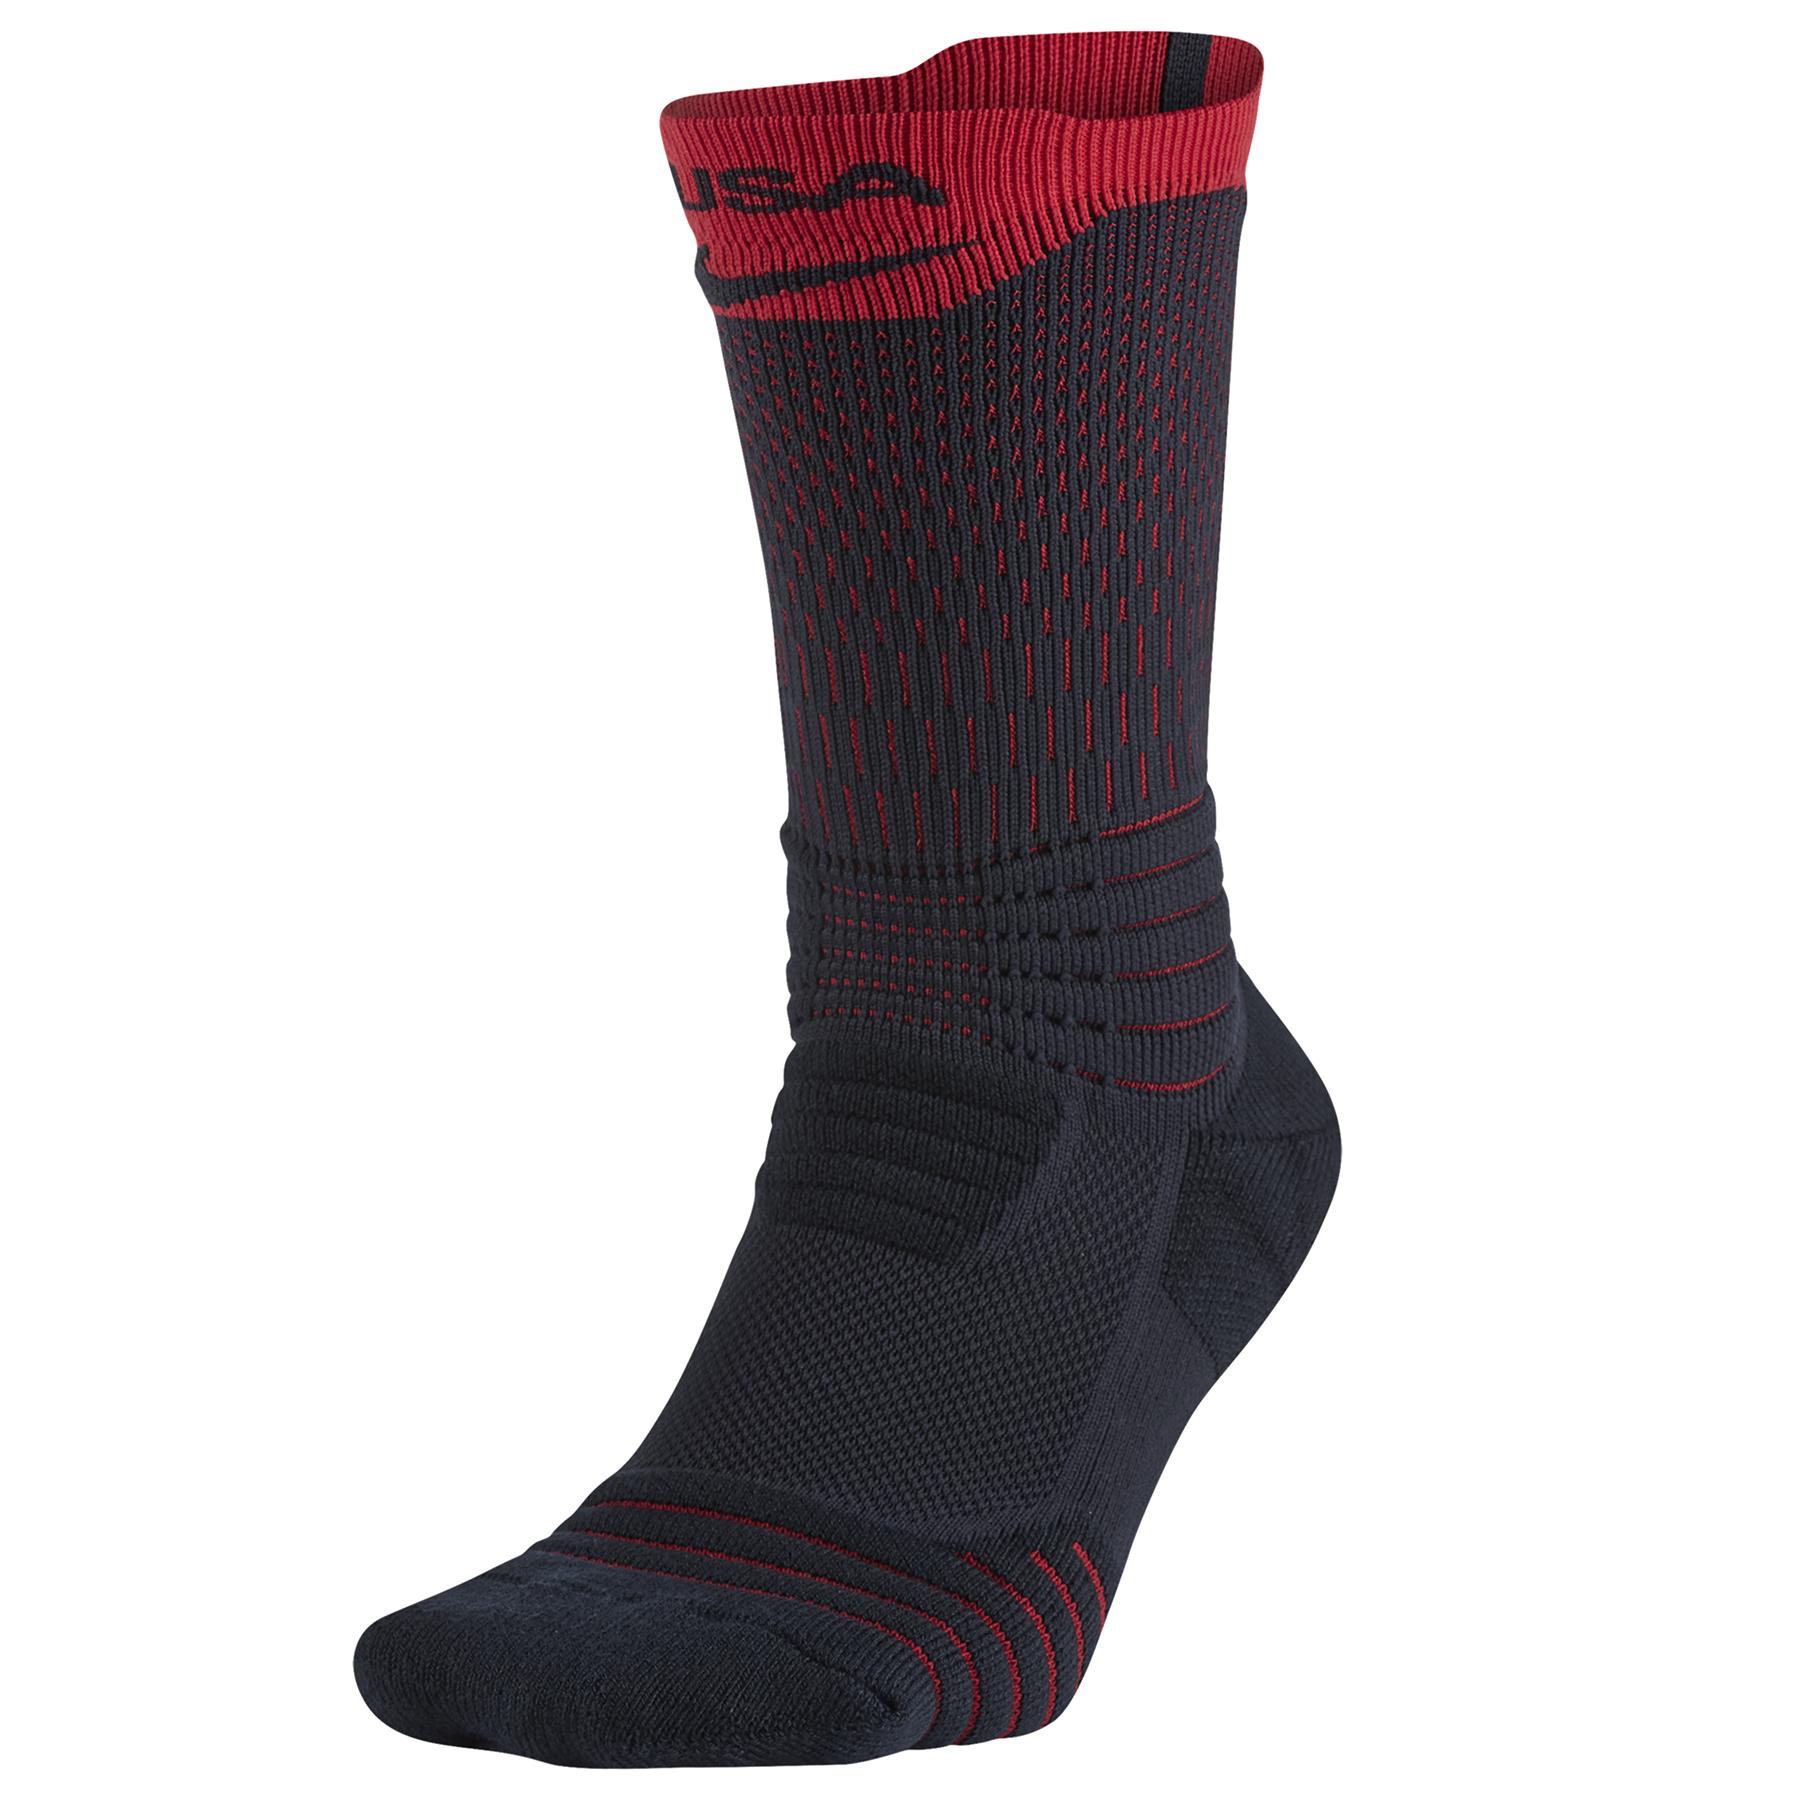 Nike Elite Versatility USAB Crew Basketball Sock - Dark Obsidian